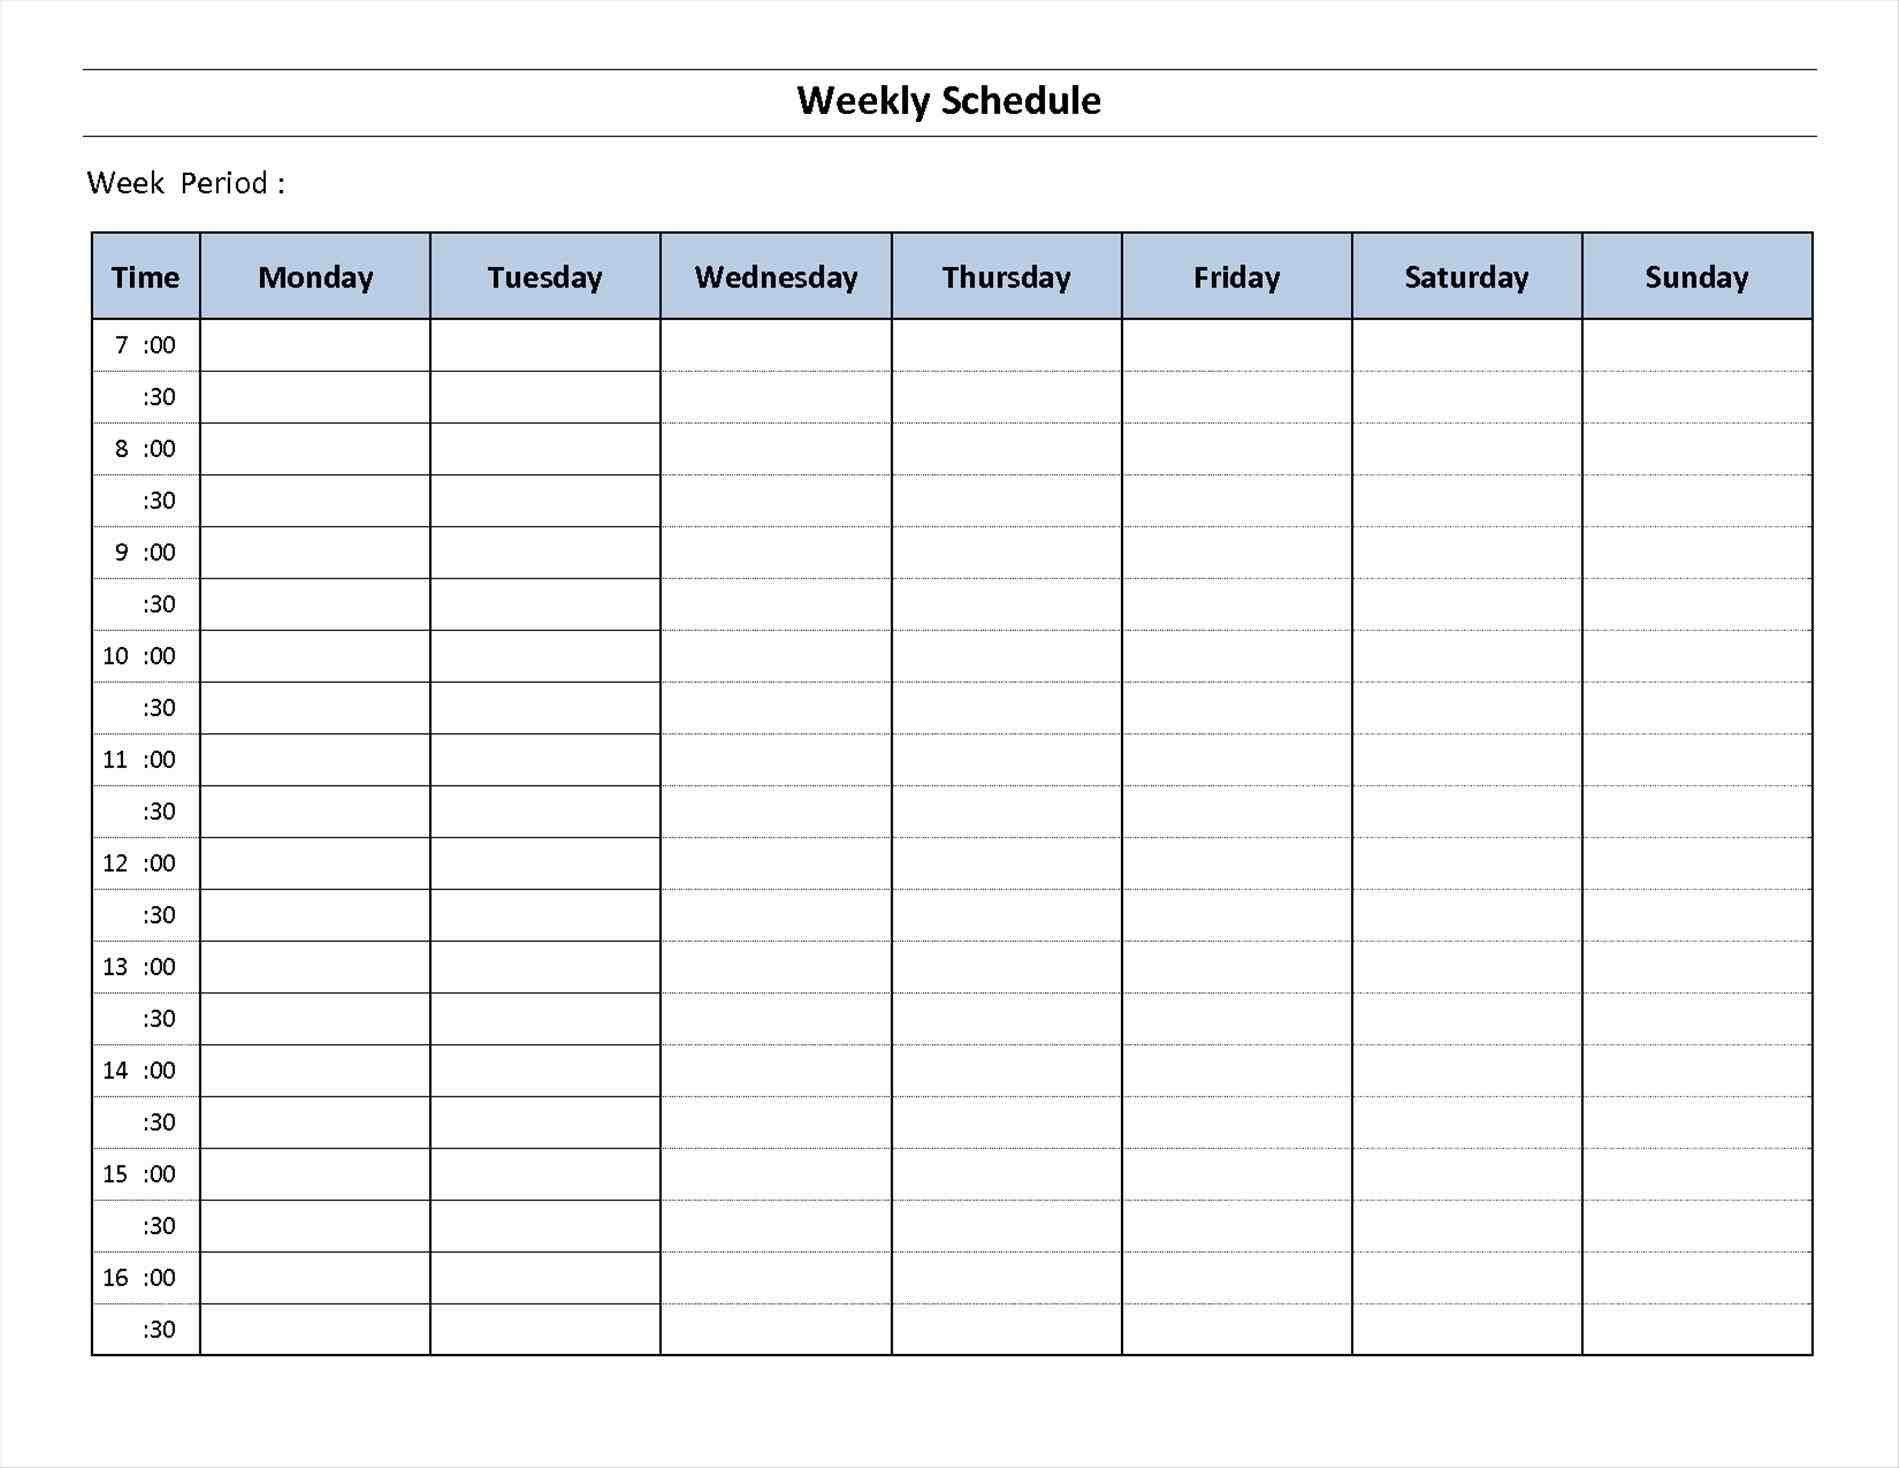 One Week Calendar Template Excel - Sample Templates Hp Free Calendars To Print